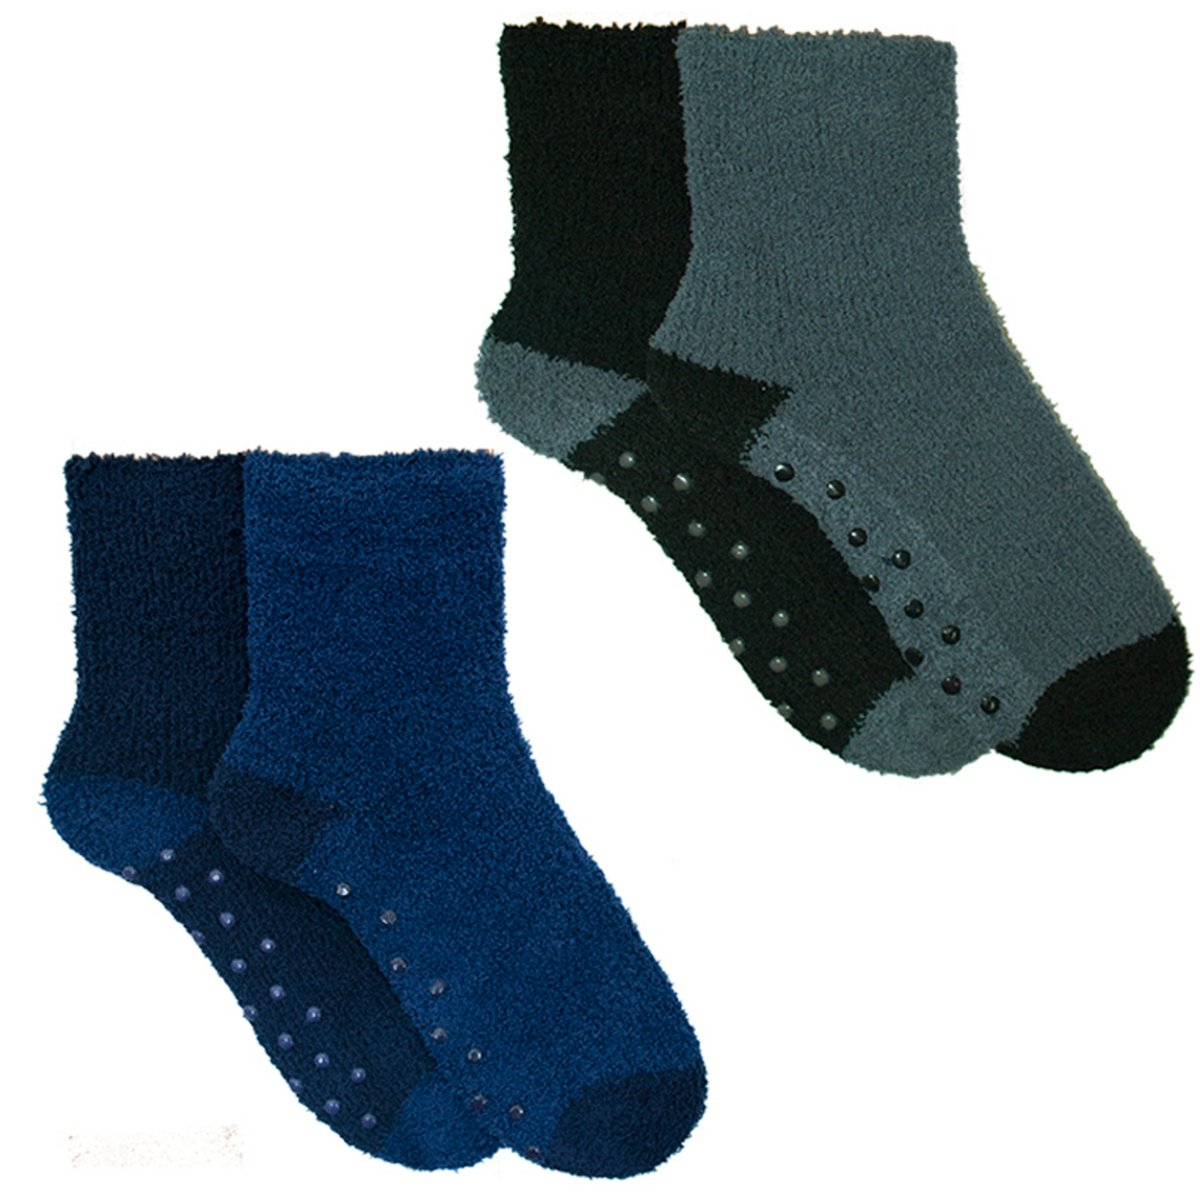 4 Pairs Mens Boys Cosy Socks Slipper Bed Super Soft Fluffy Fleece Warm Thermal Non Slip SK094